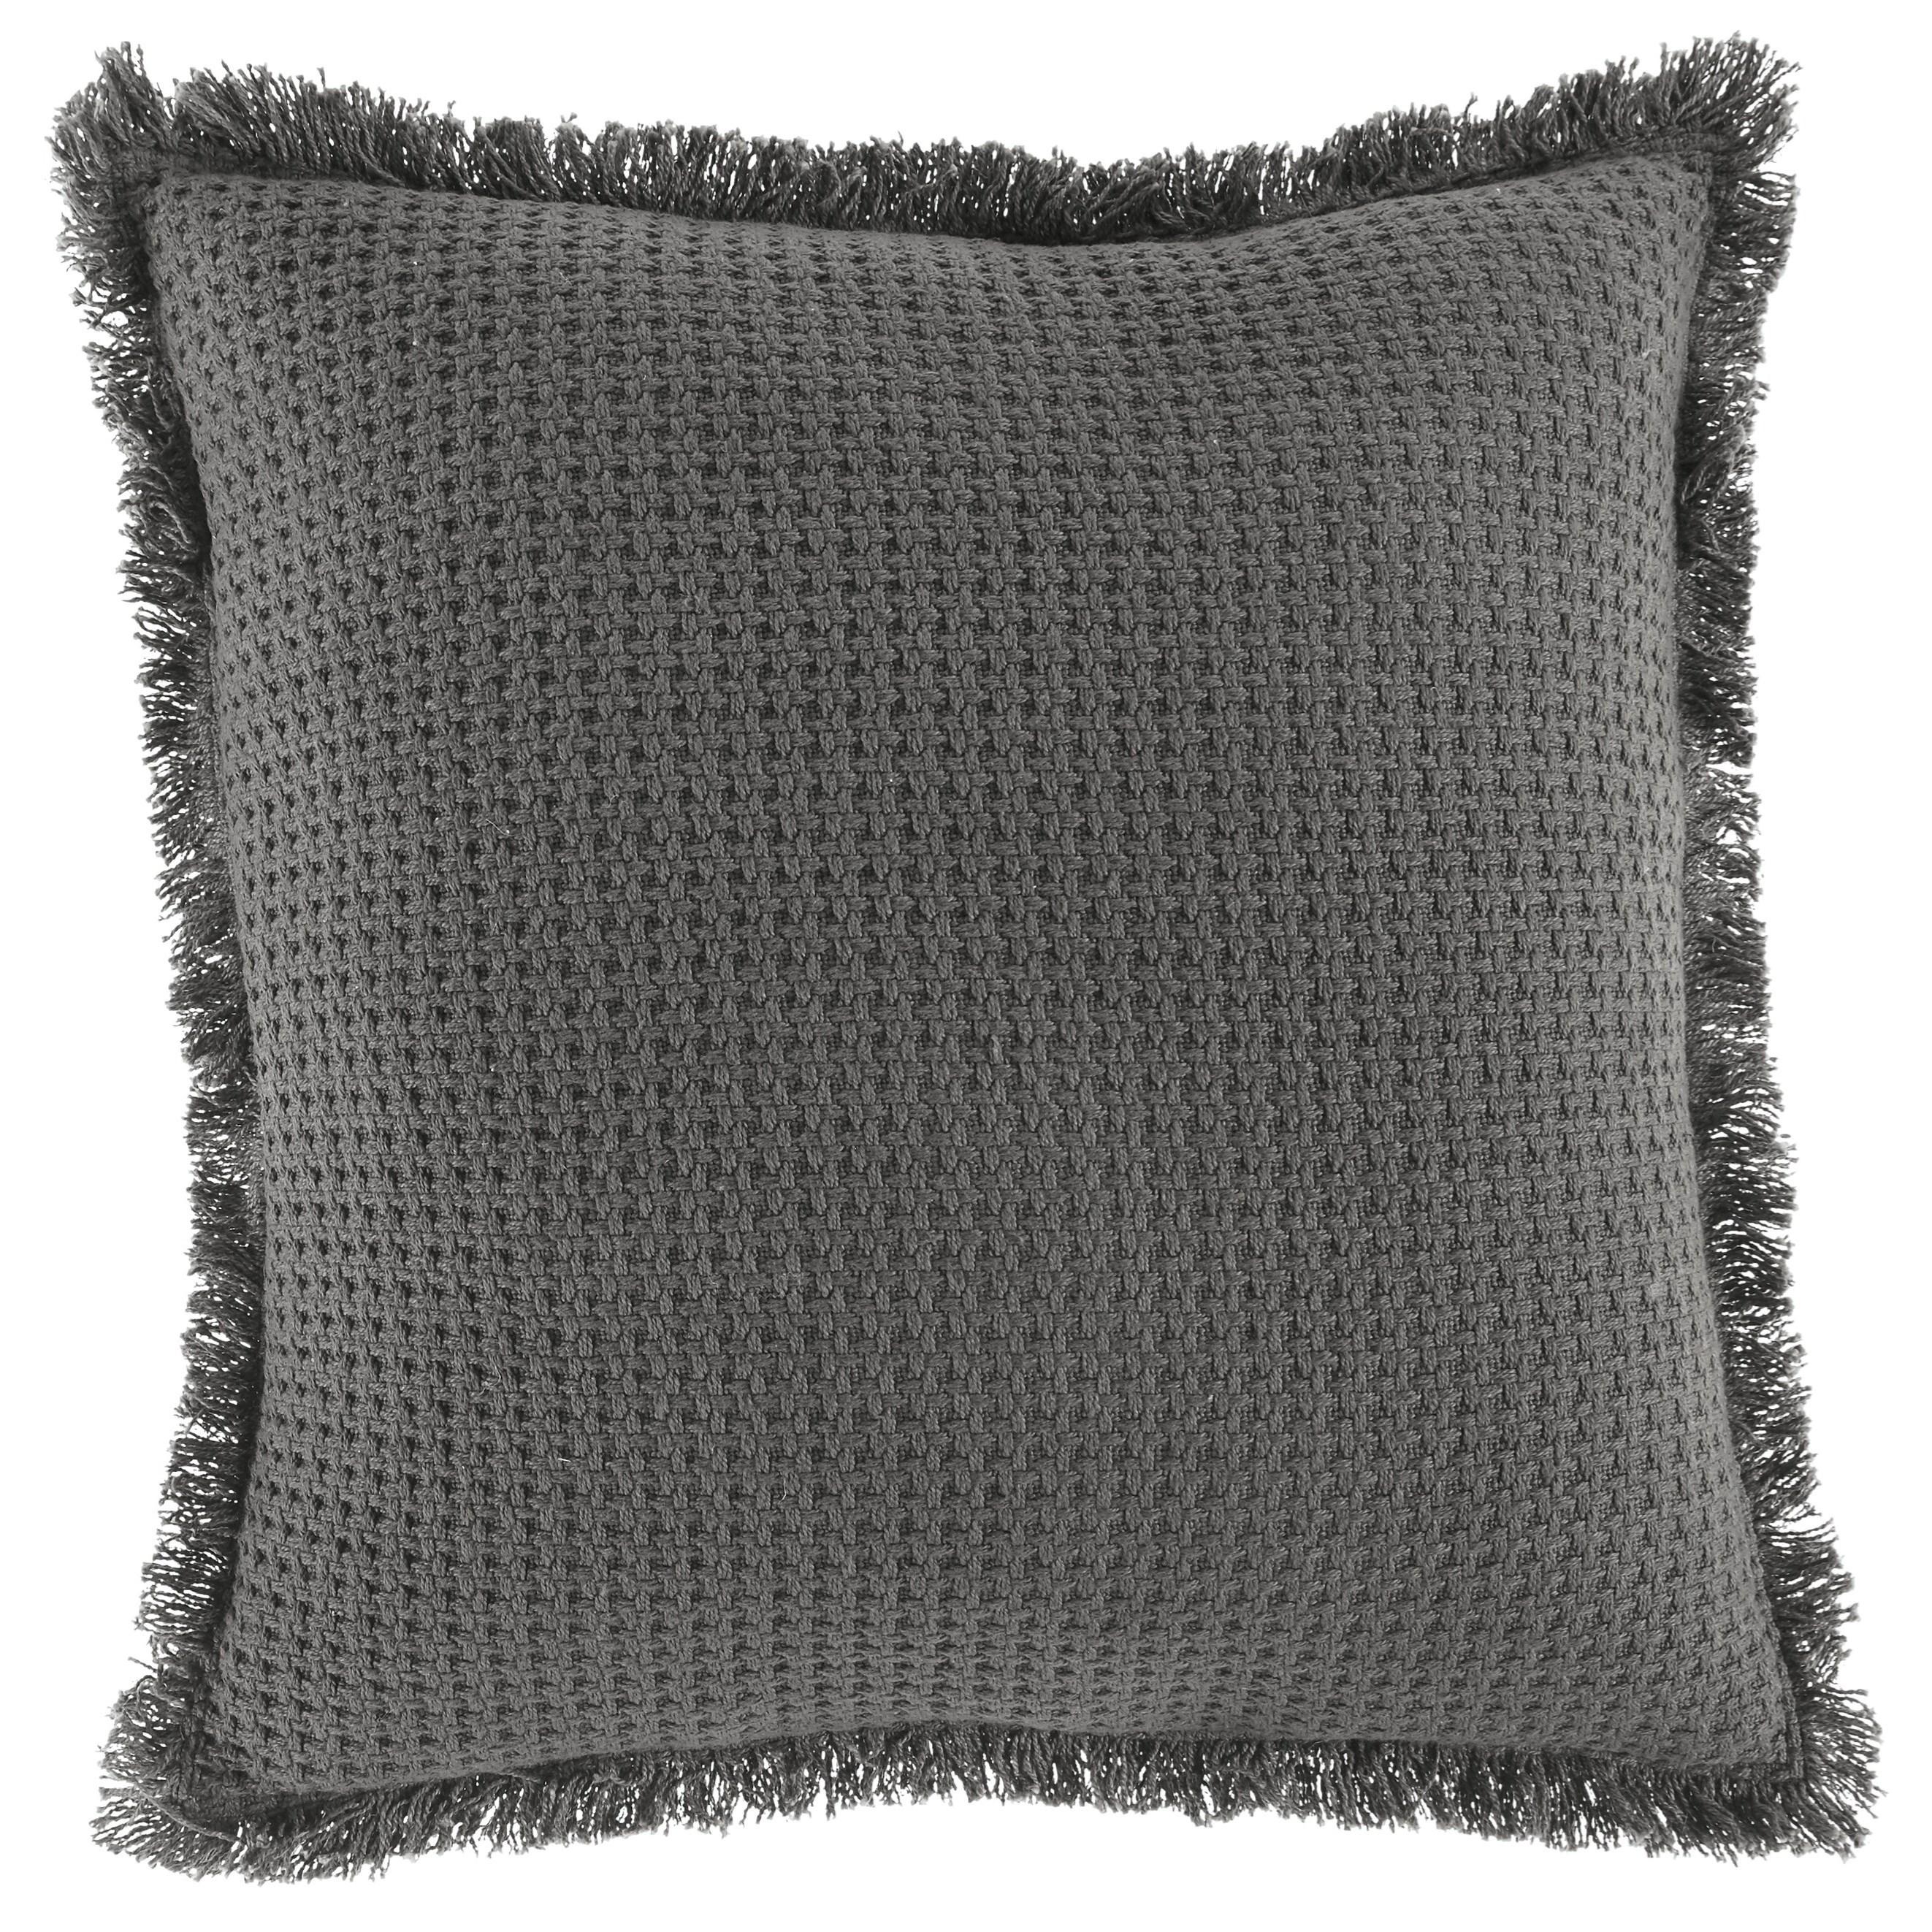 Ruysser Gray Pillow